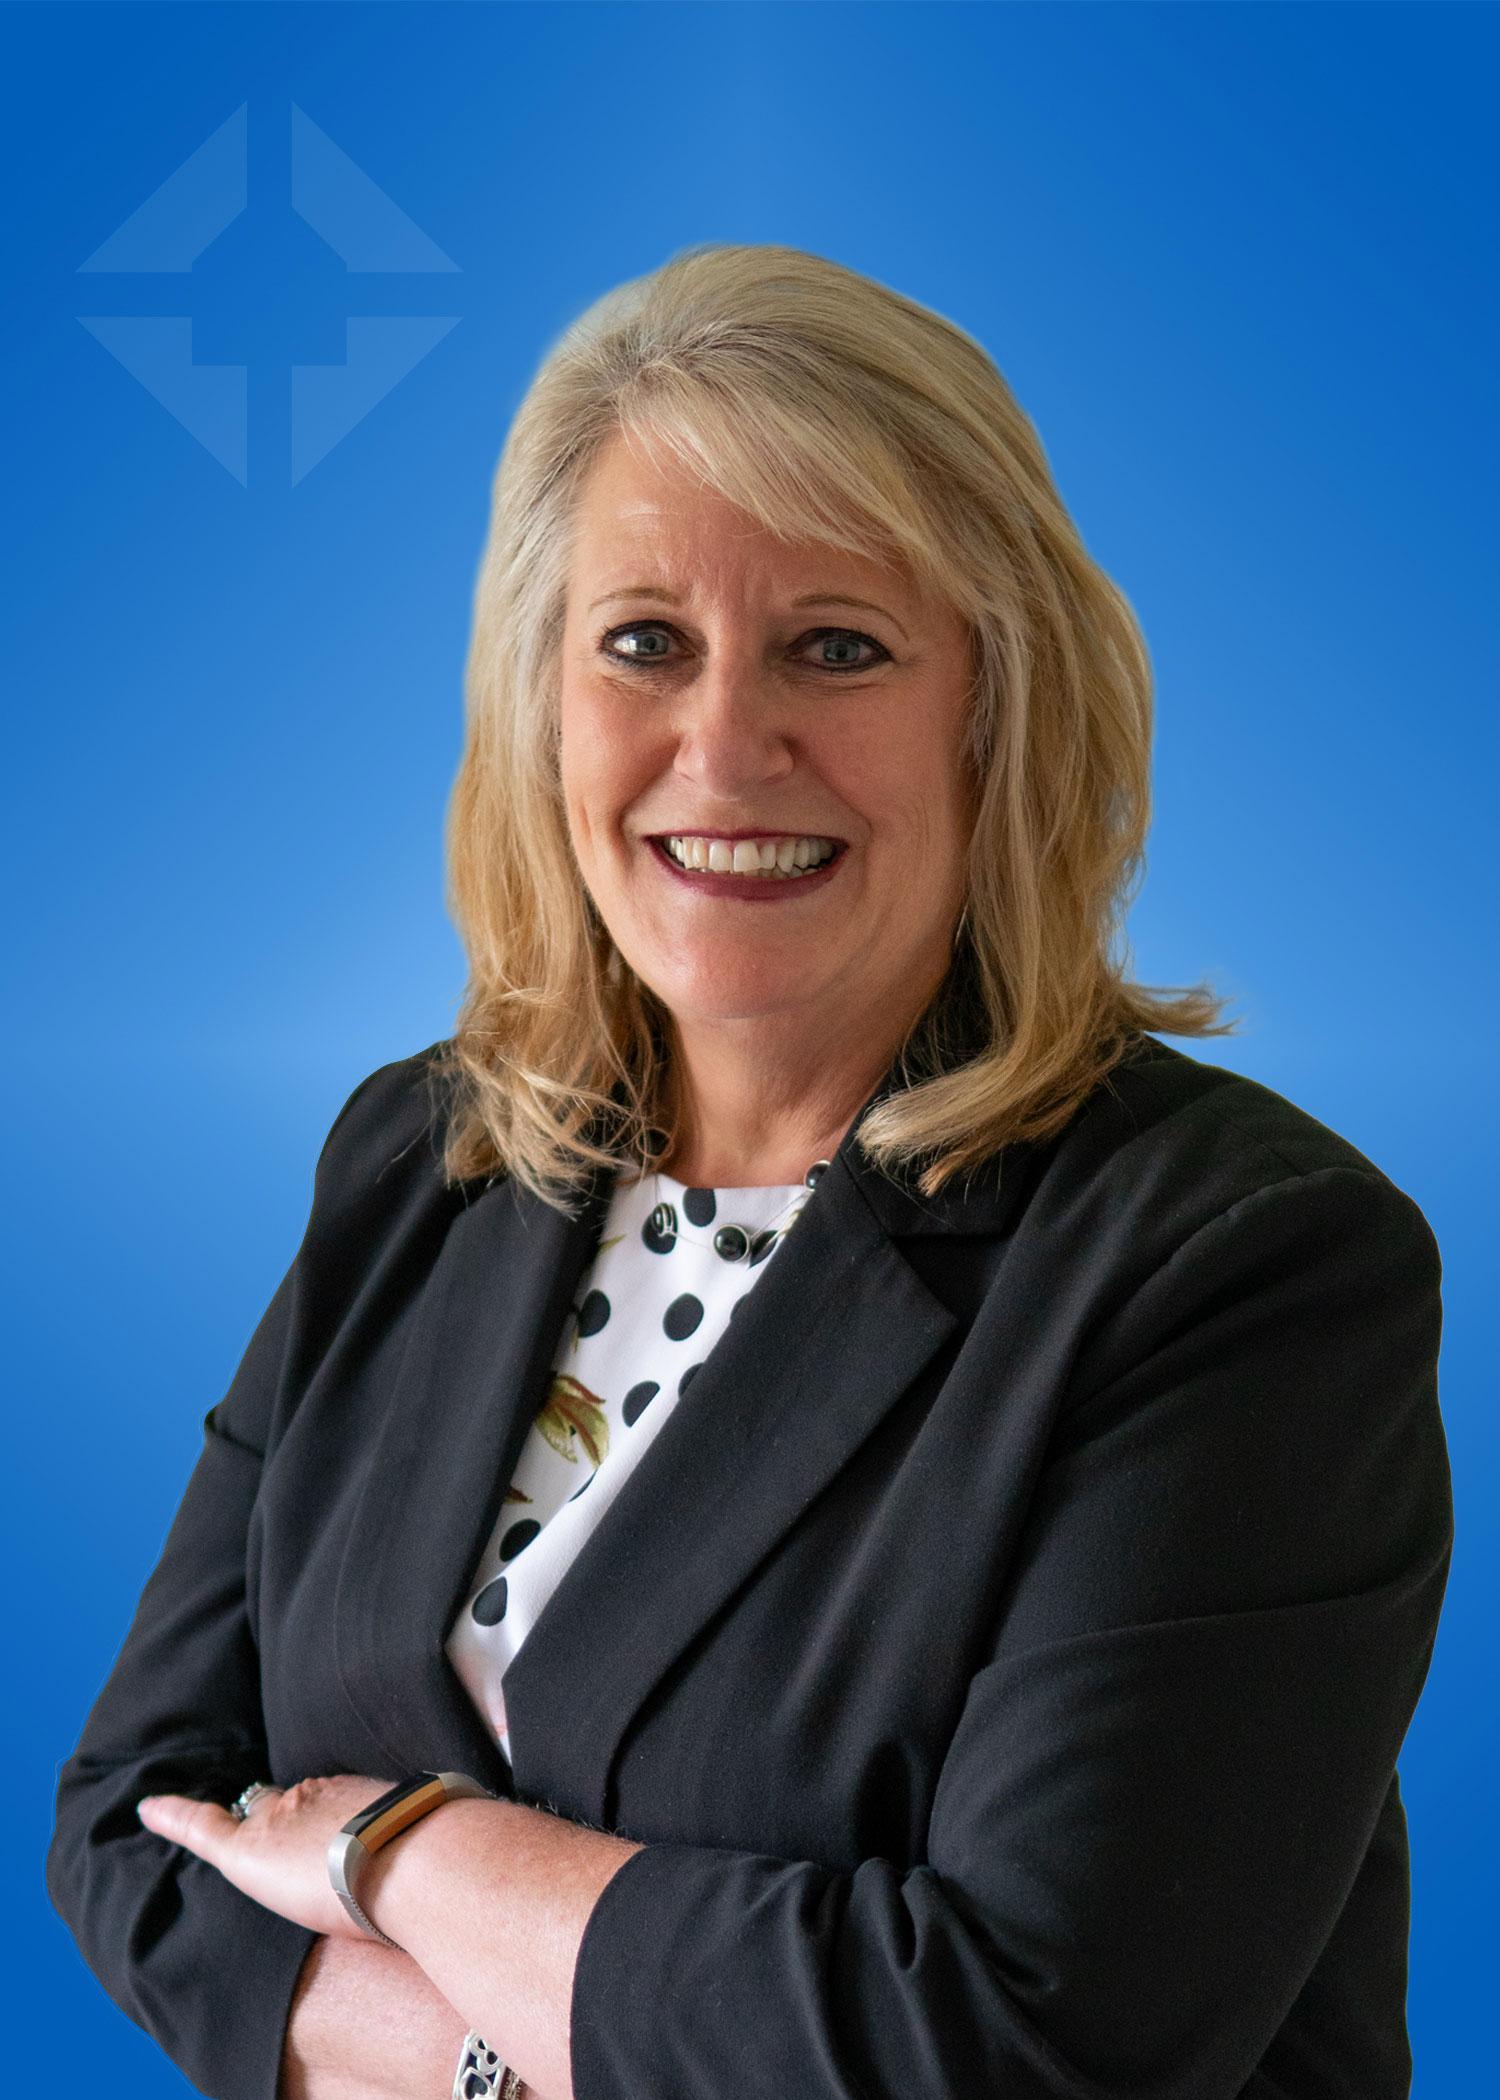 SACFCU's New President - Patty Sarne